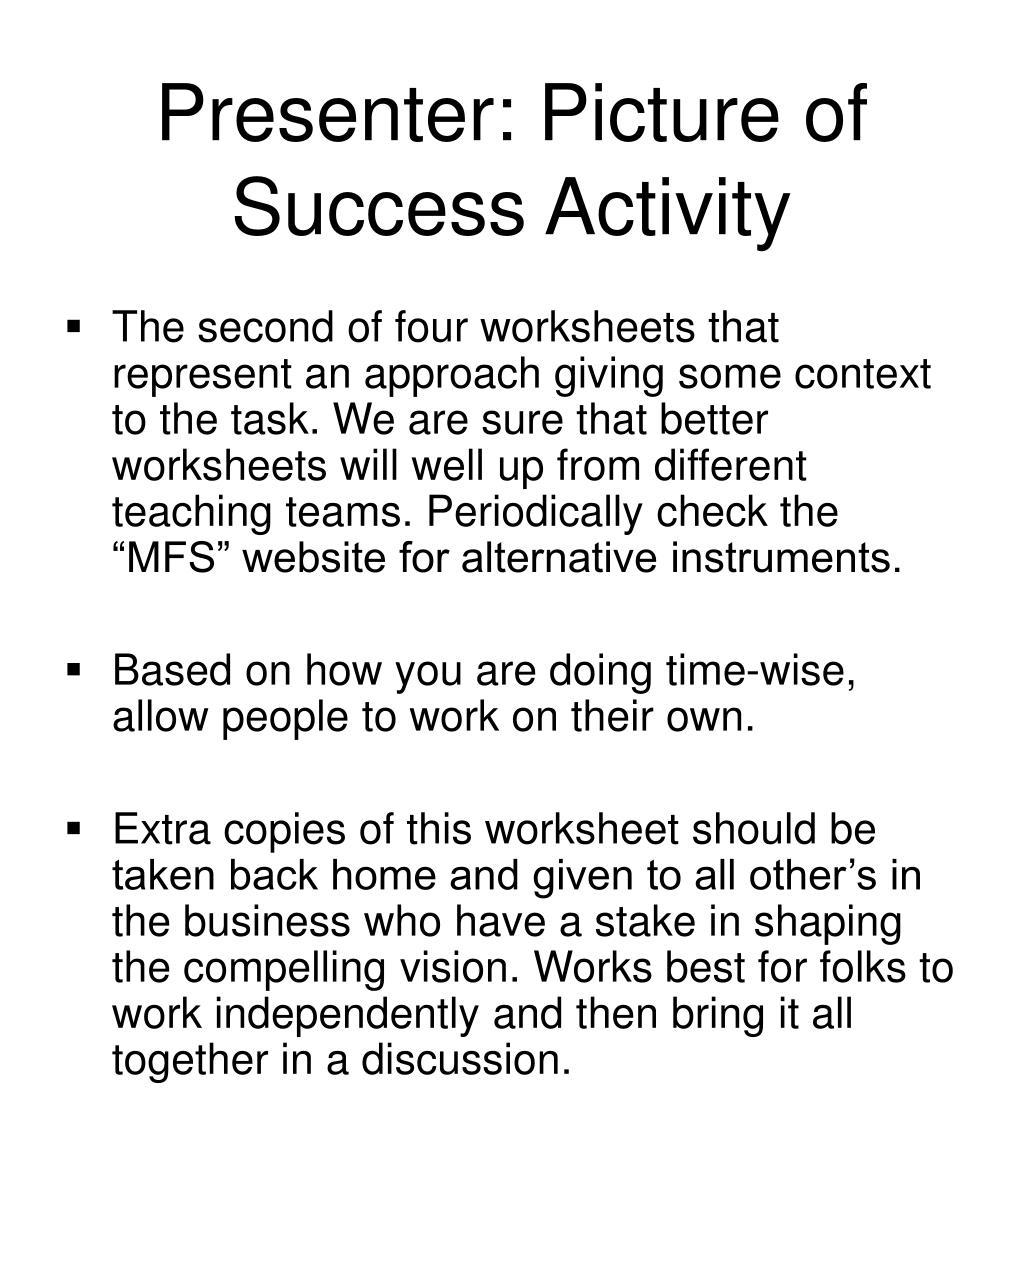 Presenter: Picture of Success Activity